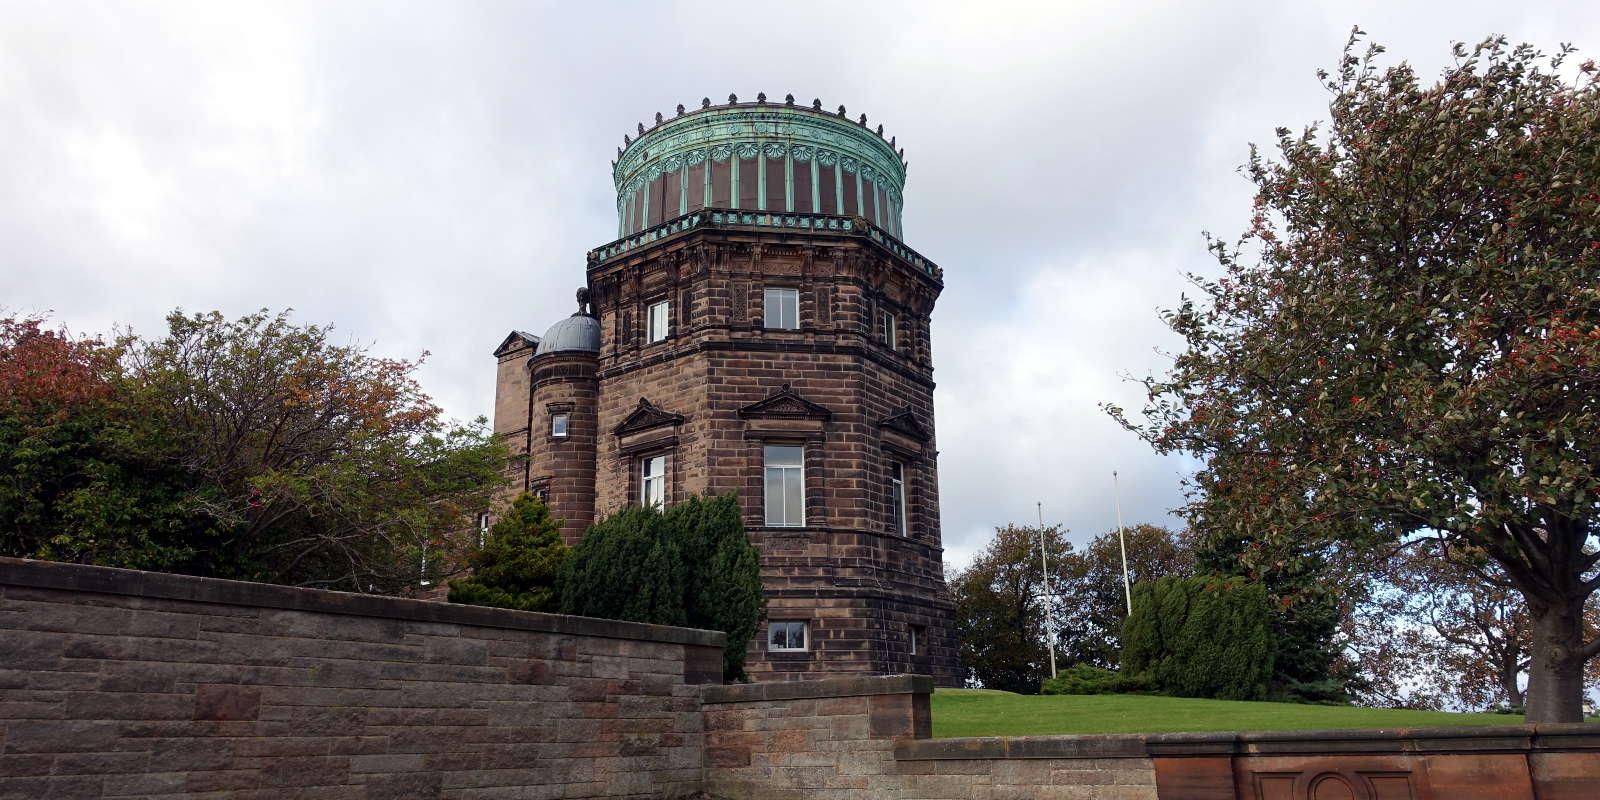 Observatory Tower on Blackford Hill in Edinburgh